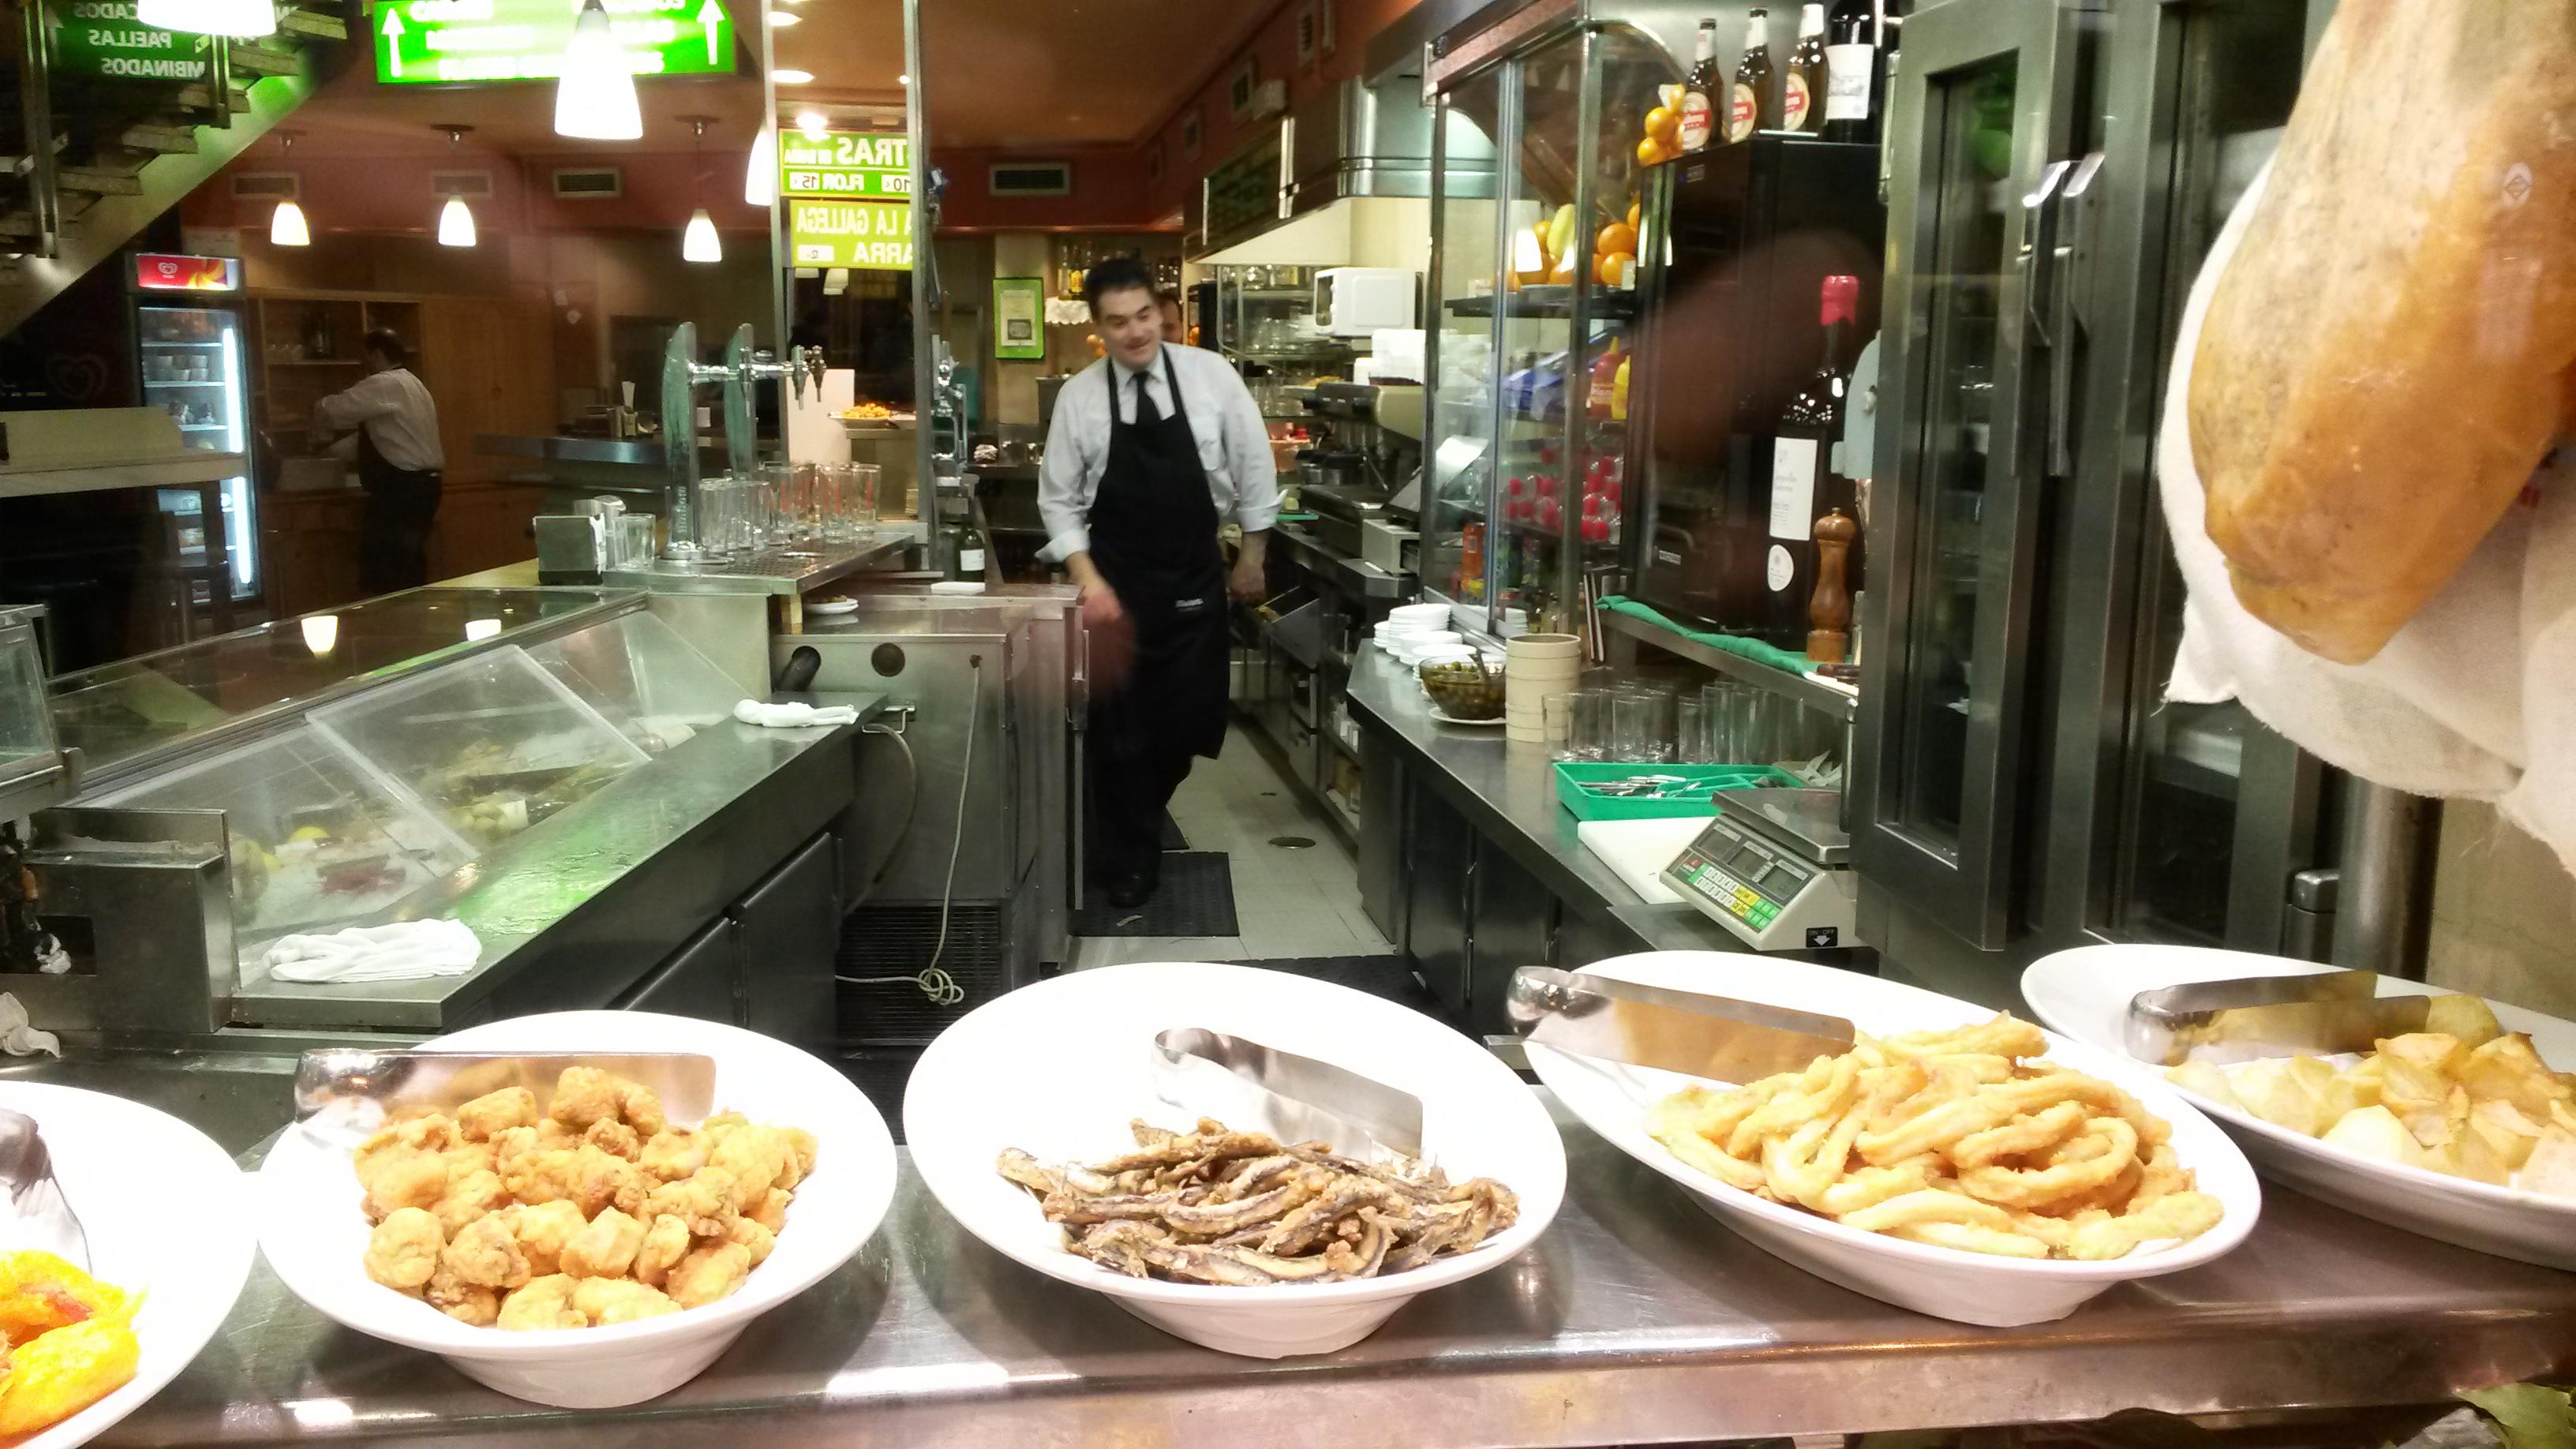 Barcelone: bars et restaurants avec une cuisine traditionnelle